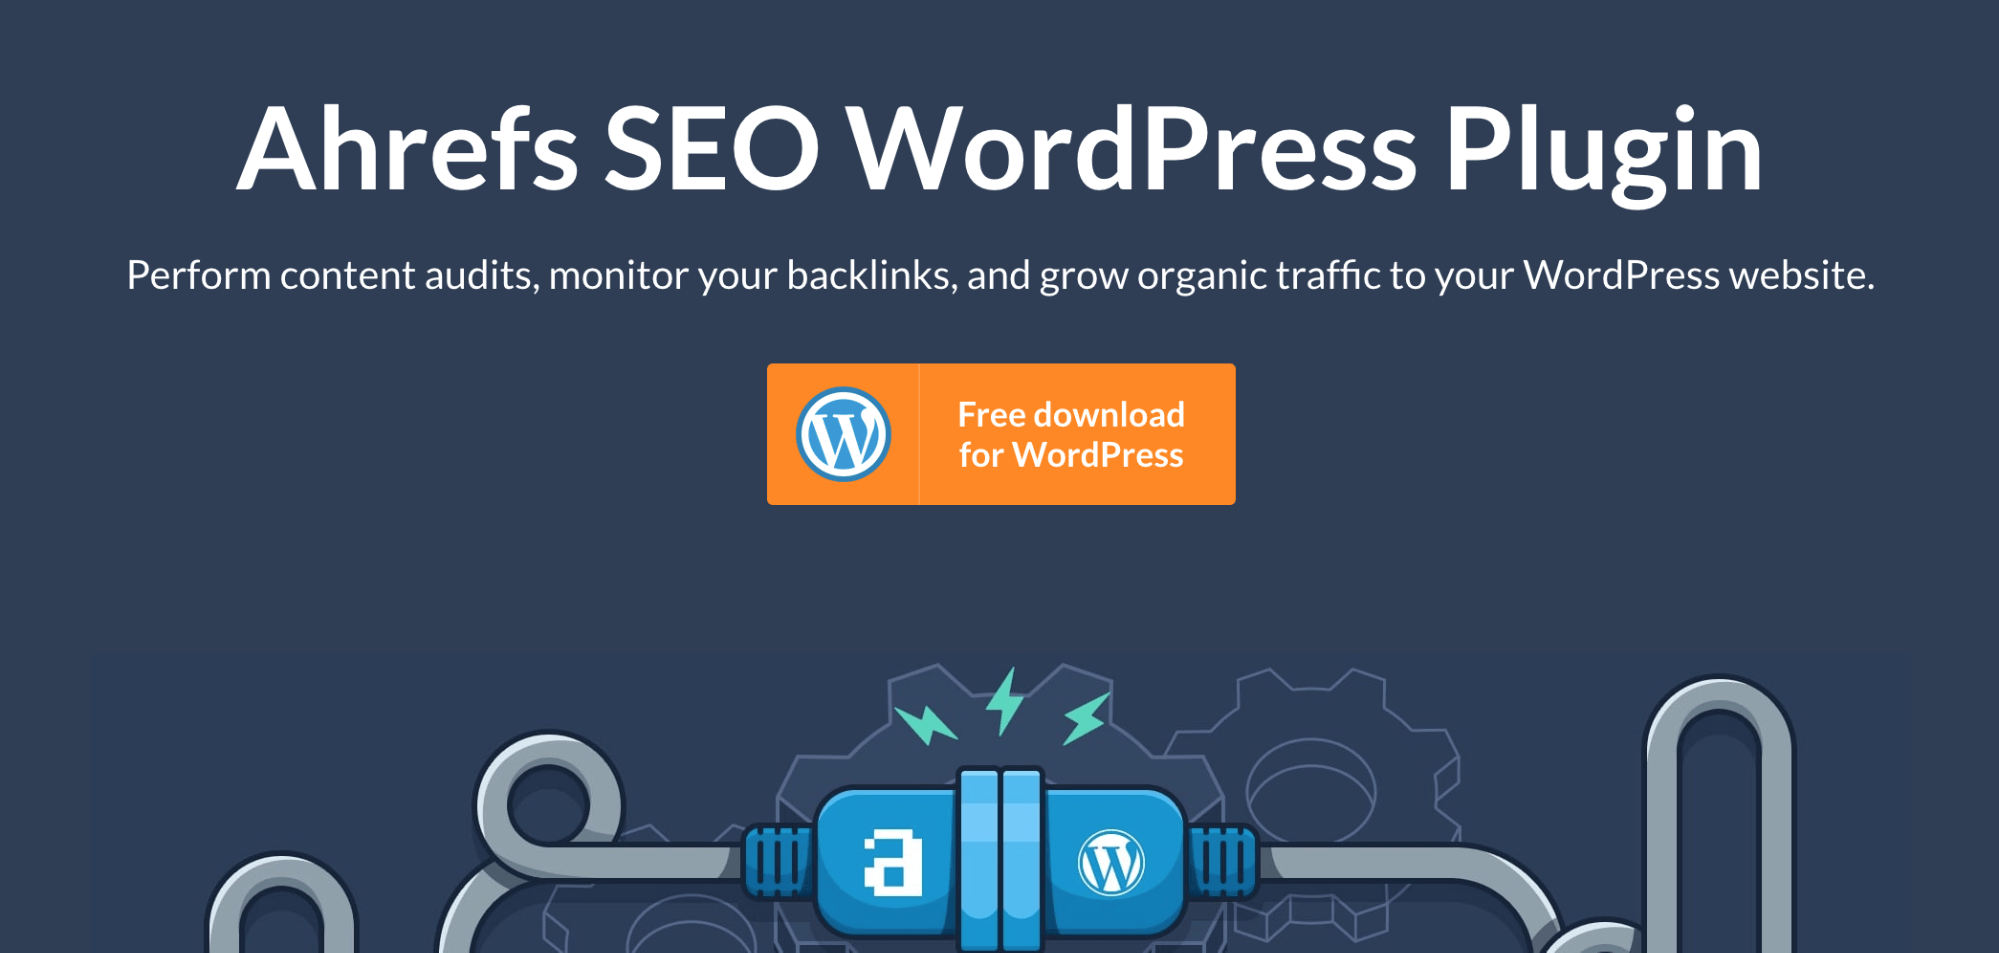 Ahrefs WordPress SEO Plugin Landing Page Snippet